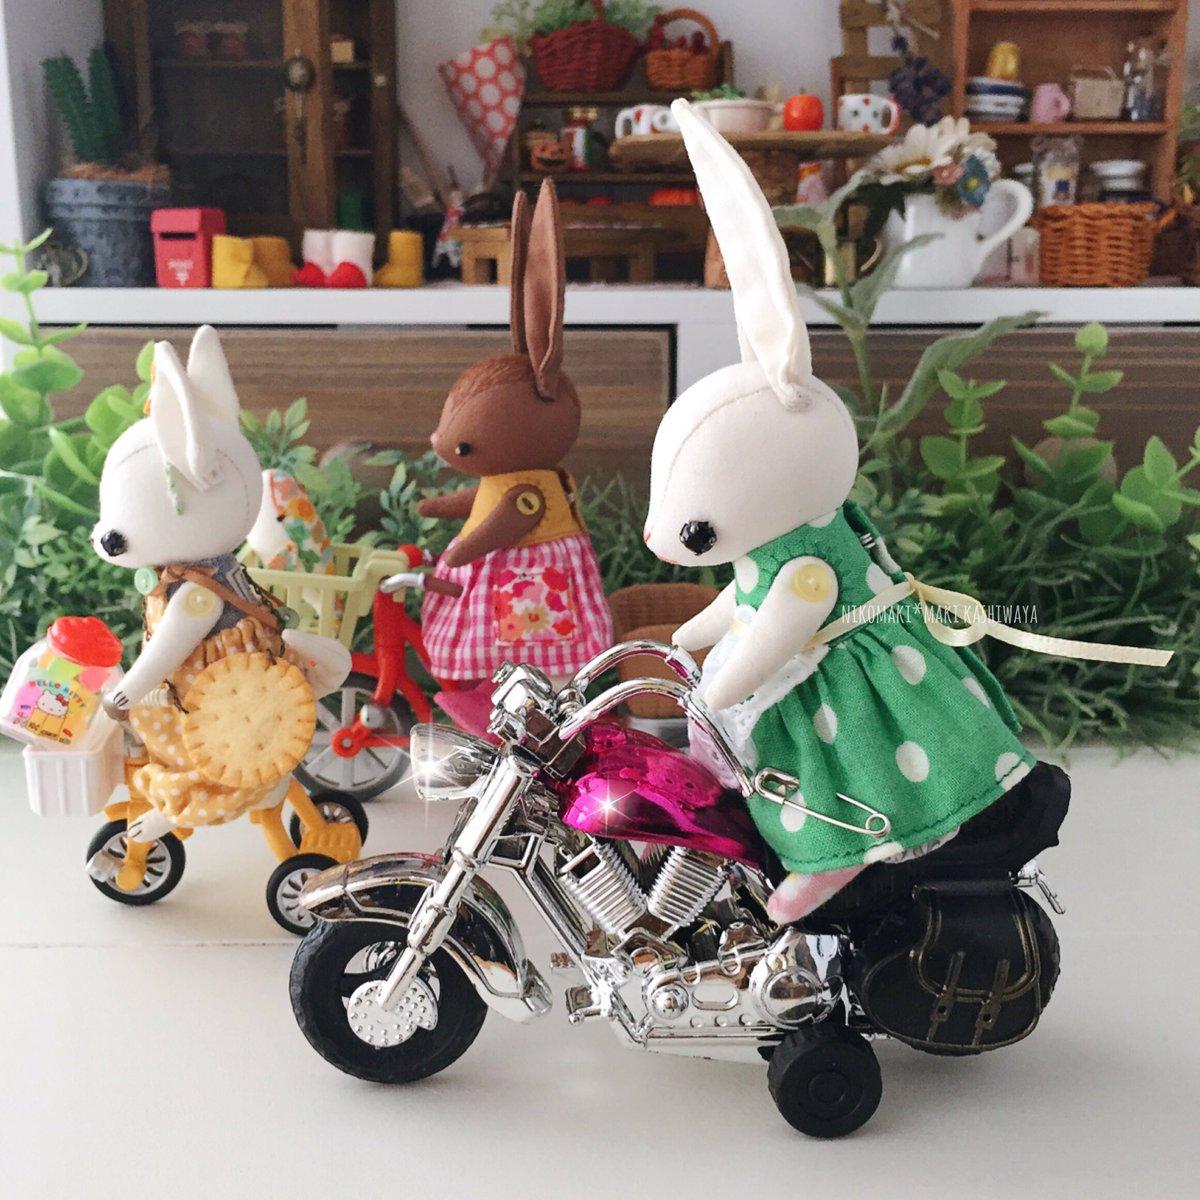 test ツイッターメディア - ??????? うさぎ、ハーレーみたいなバイクゲット(ナイスな補助輪付き) Usagi got a motorcycle (like Harley with training wheels)  バイクは #セリア のおもちゃです。色を塗ったりしても良さそう??? #100均 https://t.co/WZcbZsUG3T